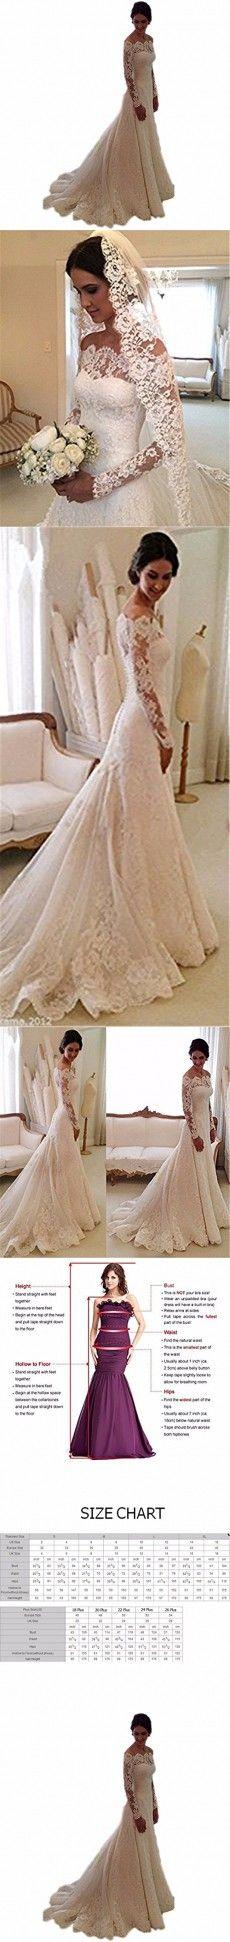 Arrowder Vintage Long Sleeves Beteau Lace Mermaid Wedding Dresses 2016 US Size 8 Ivory